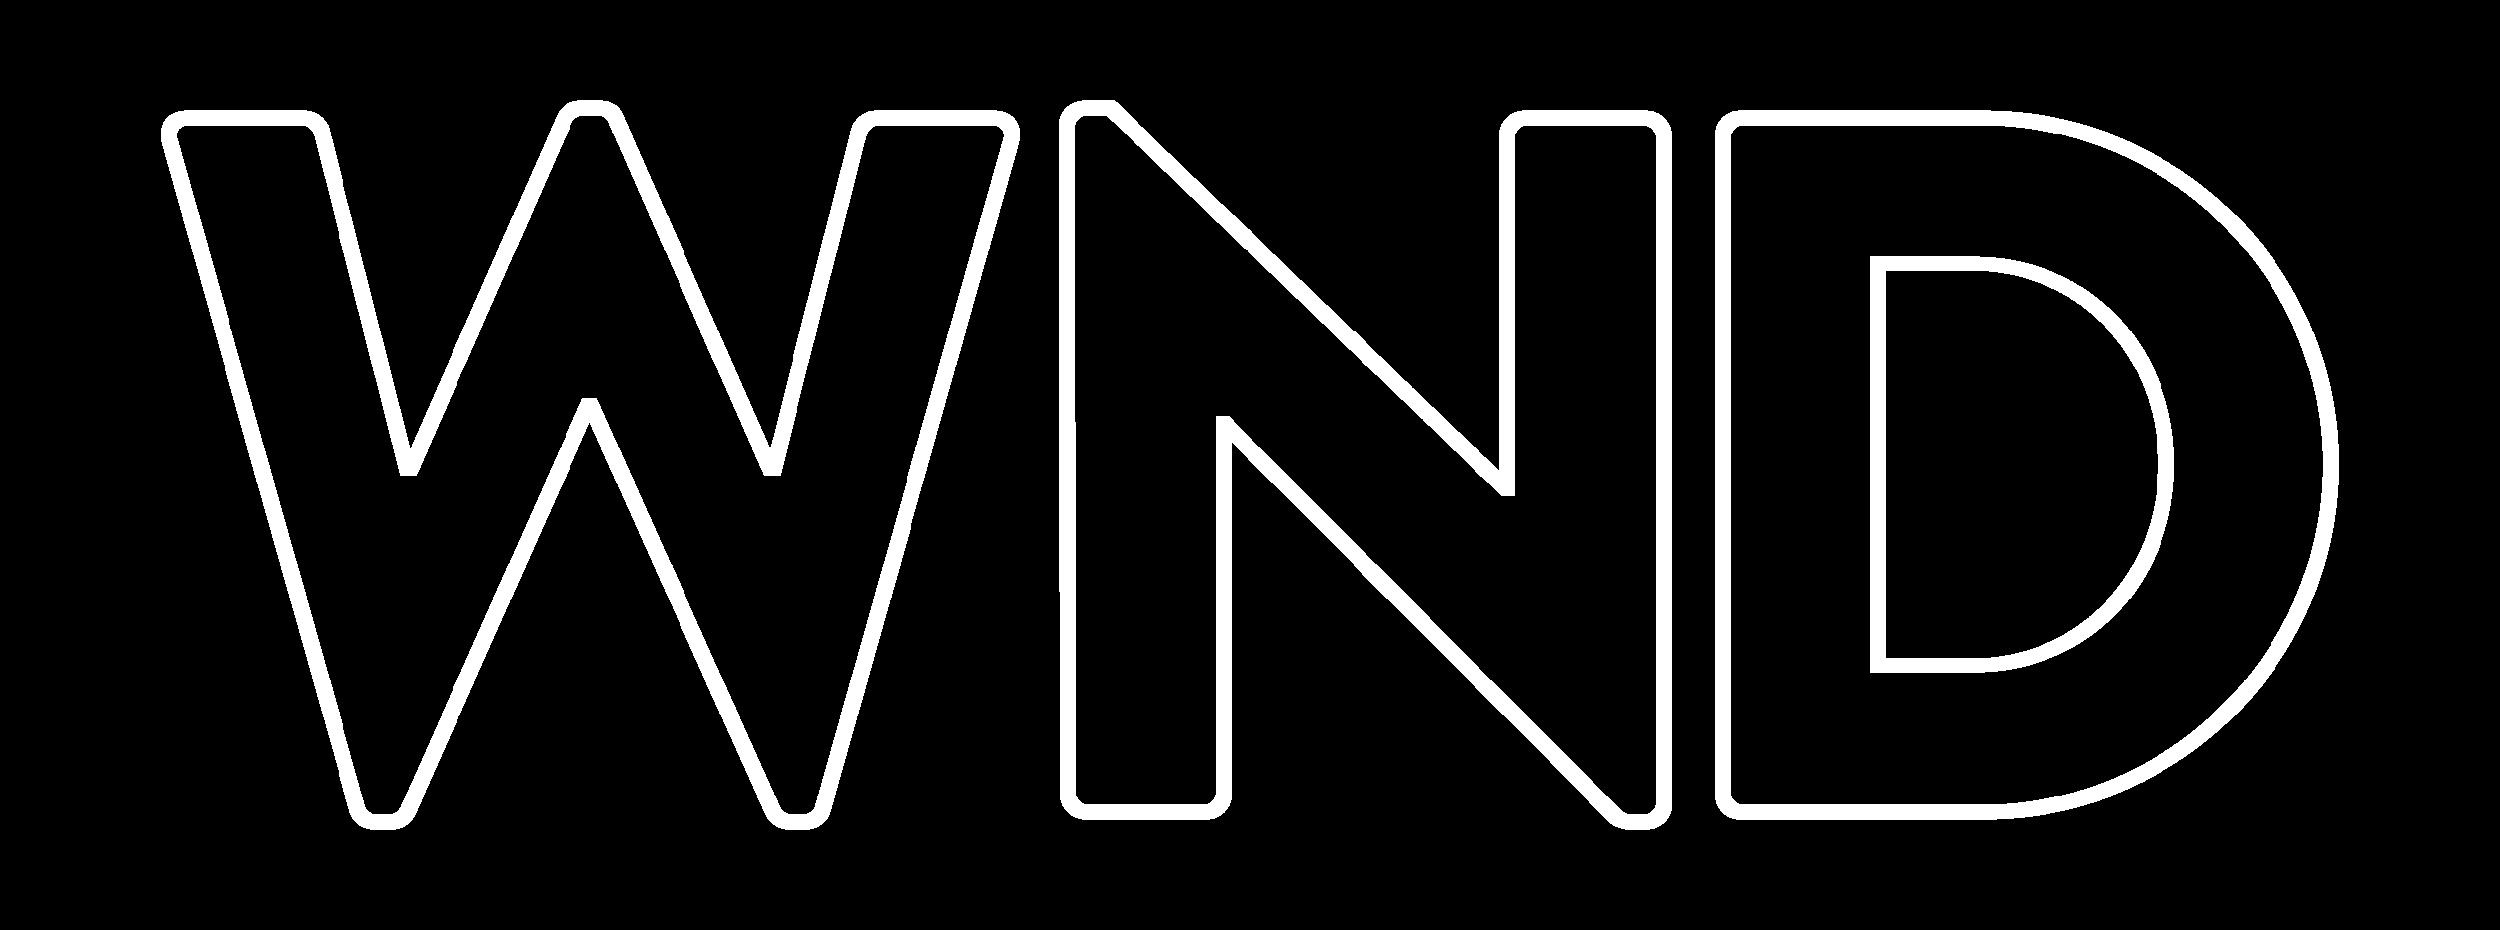 WND_logo.png